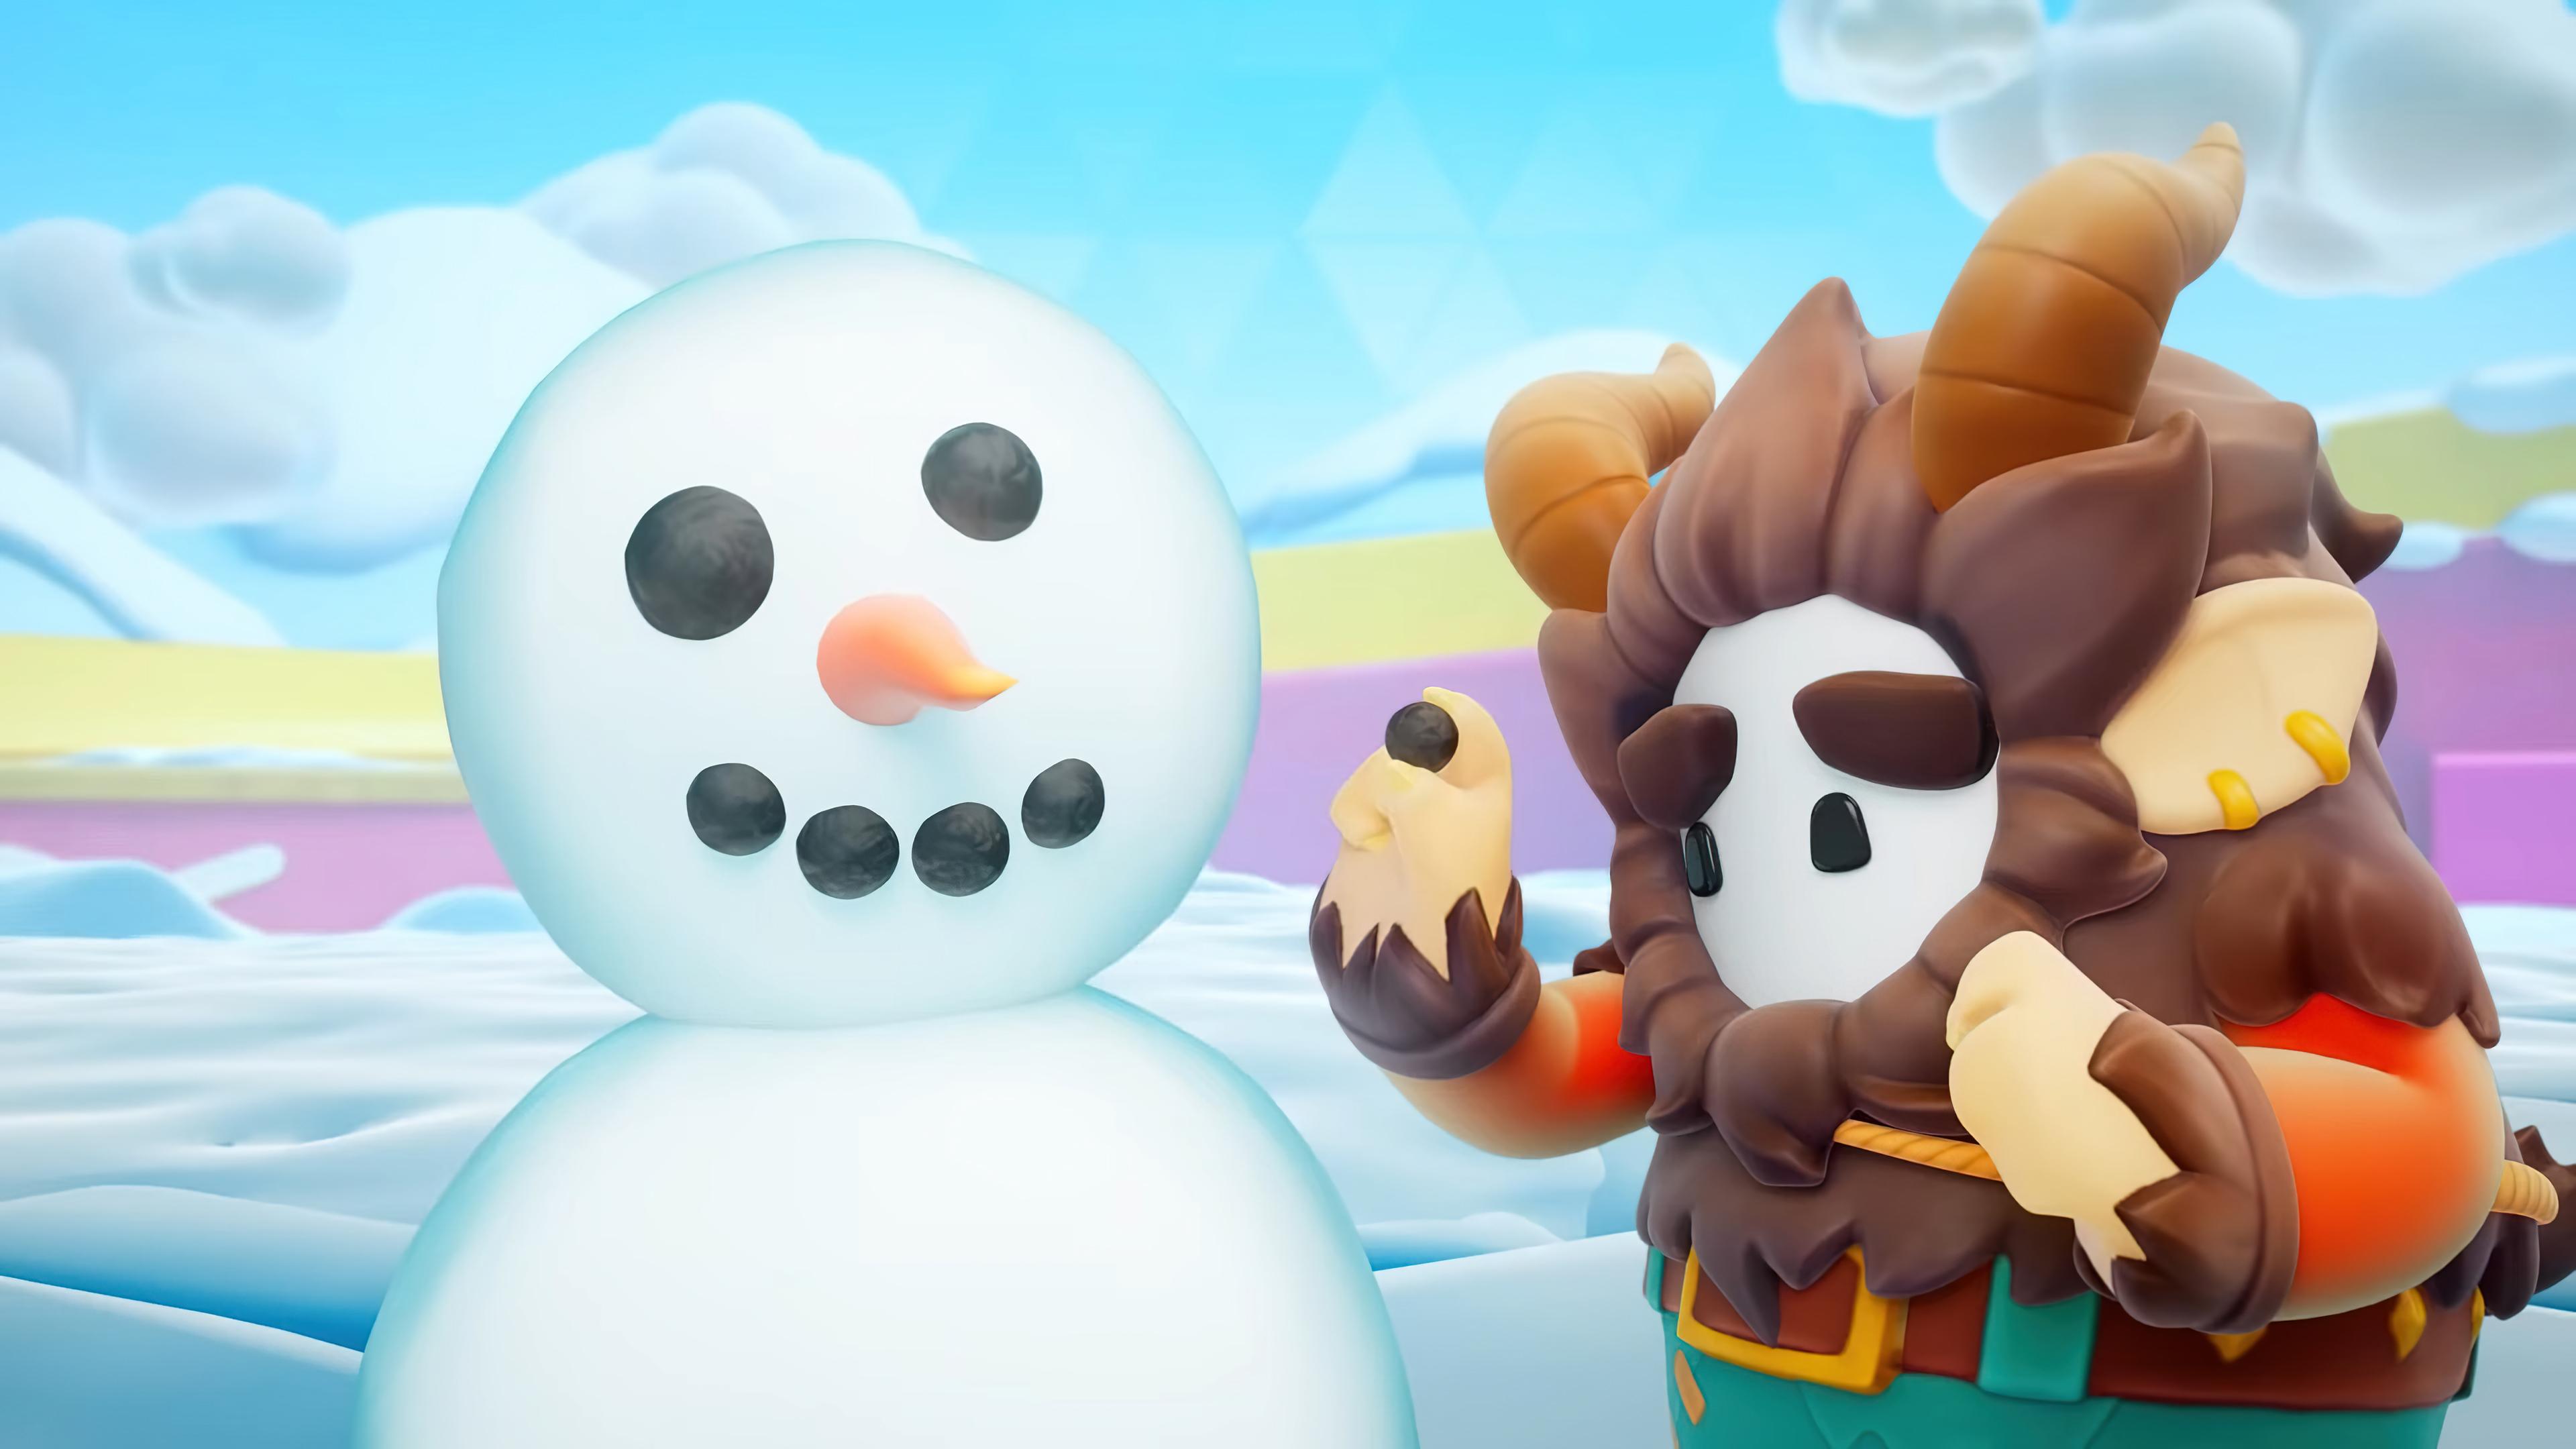 Fondos de pantalla Fall guys hombre de nieve Temporada 3